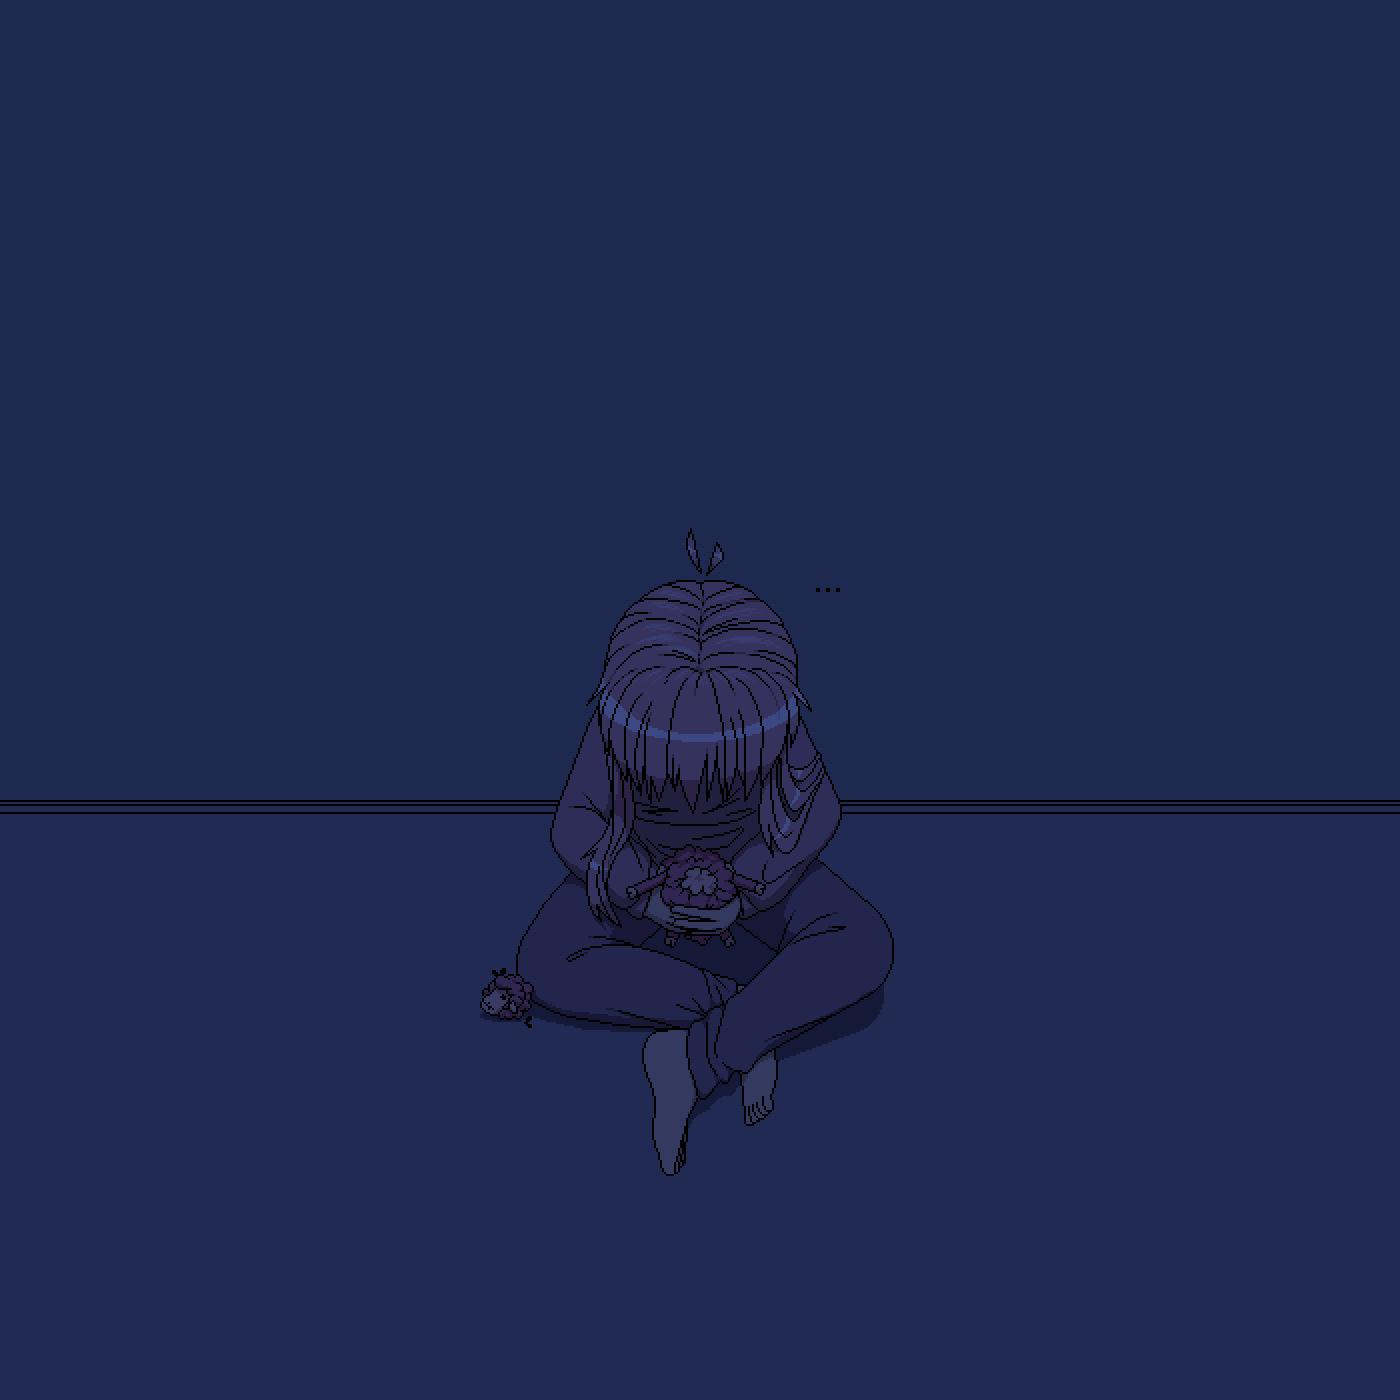 main-image-Loss of Innocence  by Kido